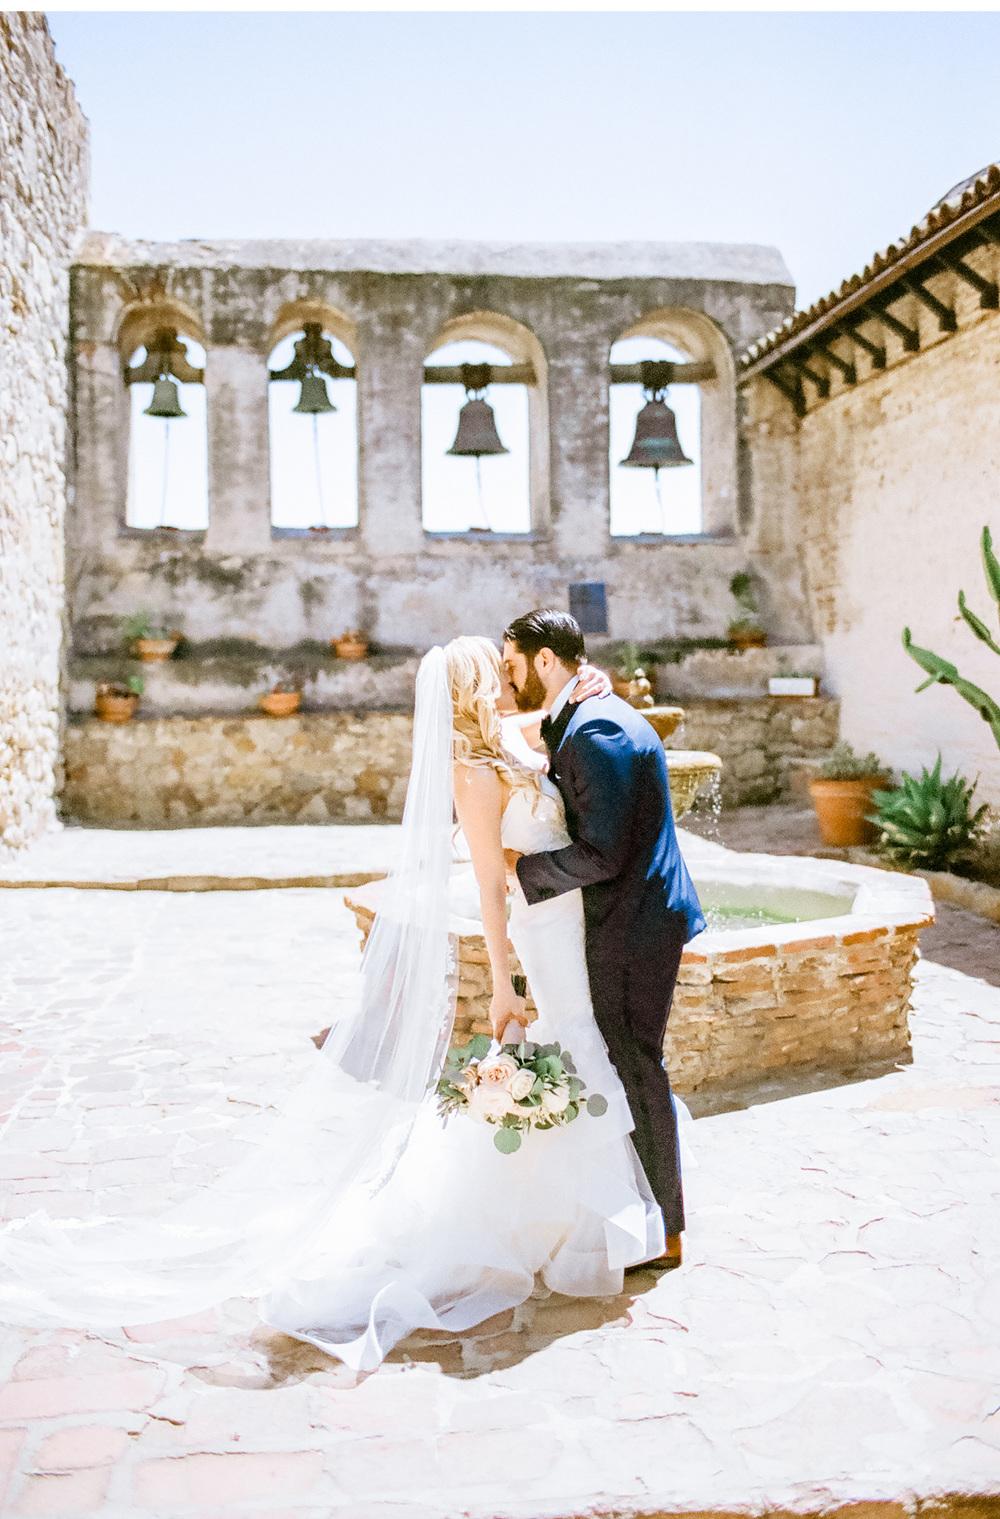 San-Juan-Capistrano-Wedding-Natalie-Schutt-Photography_06.jpg